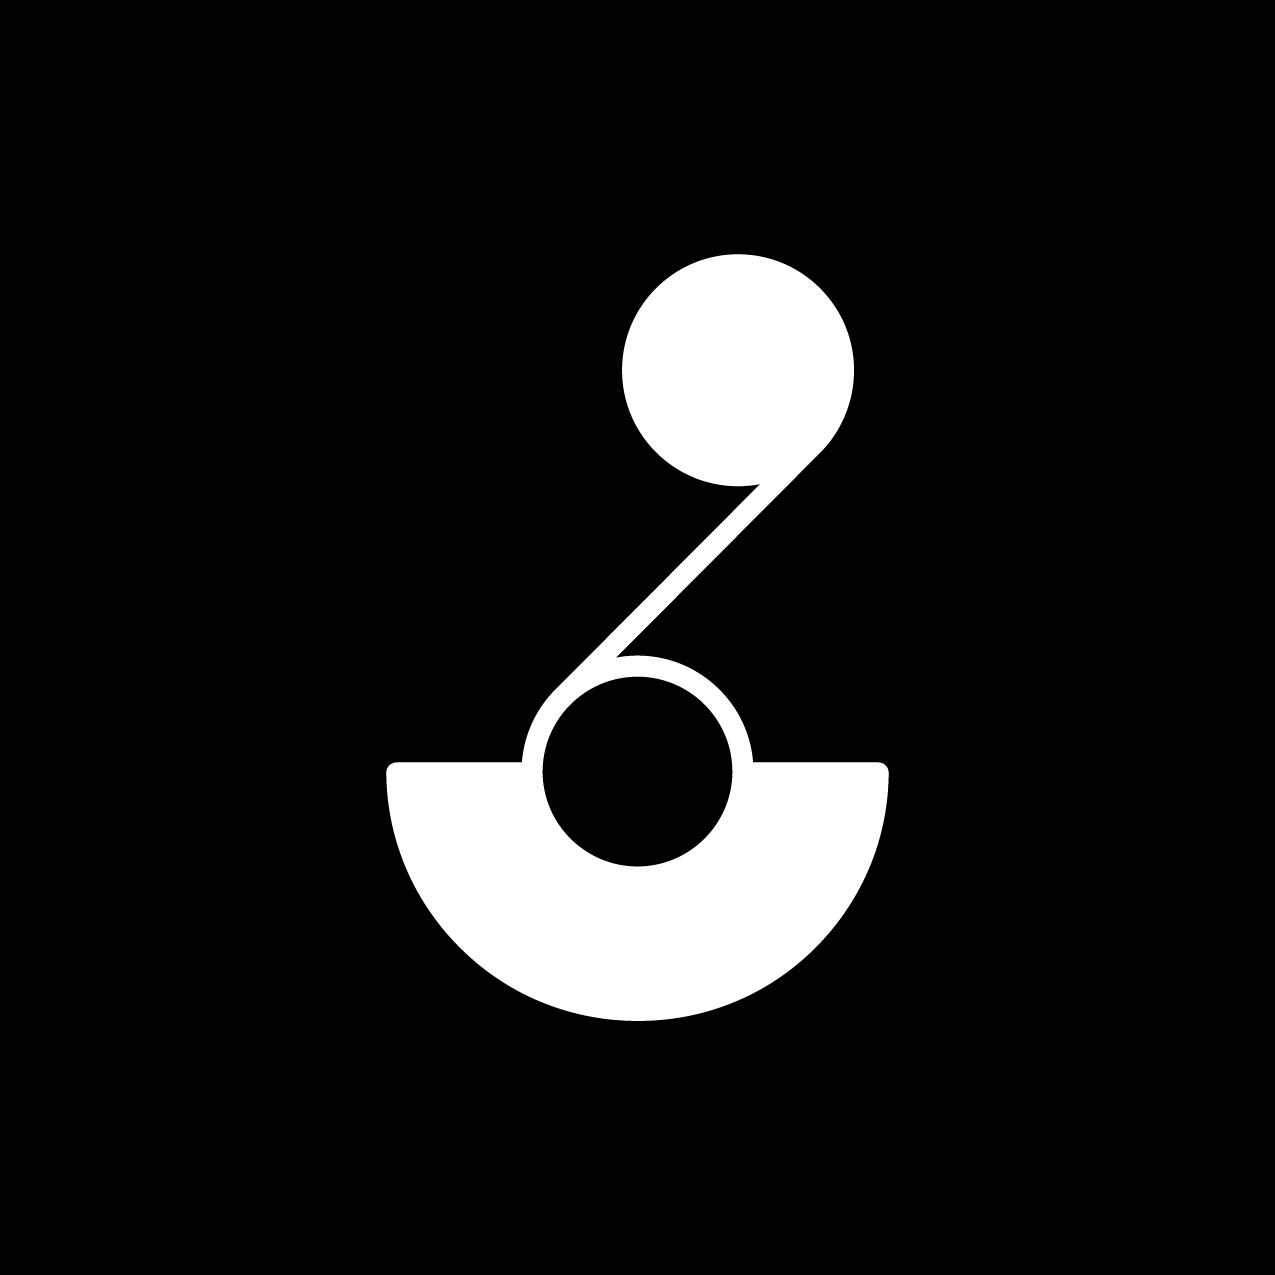 Letter J10 Design by Furia